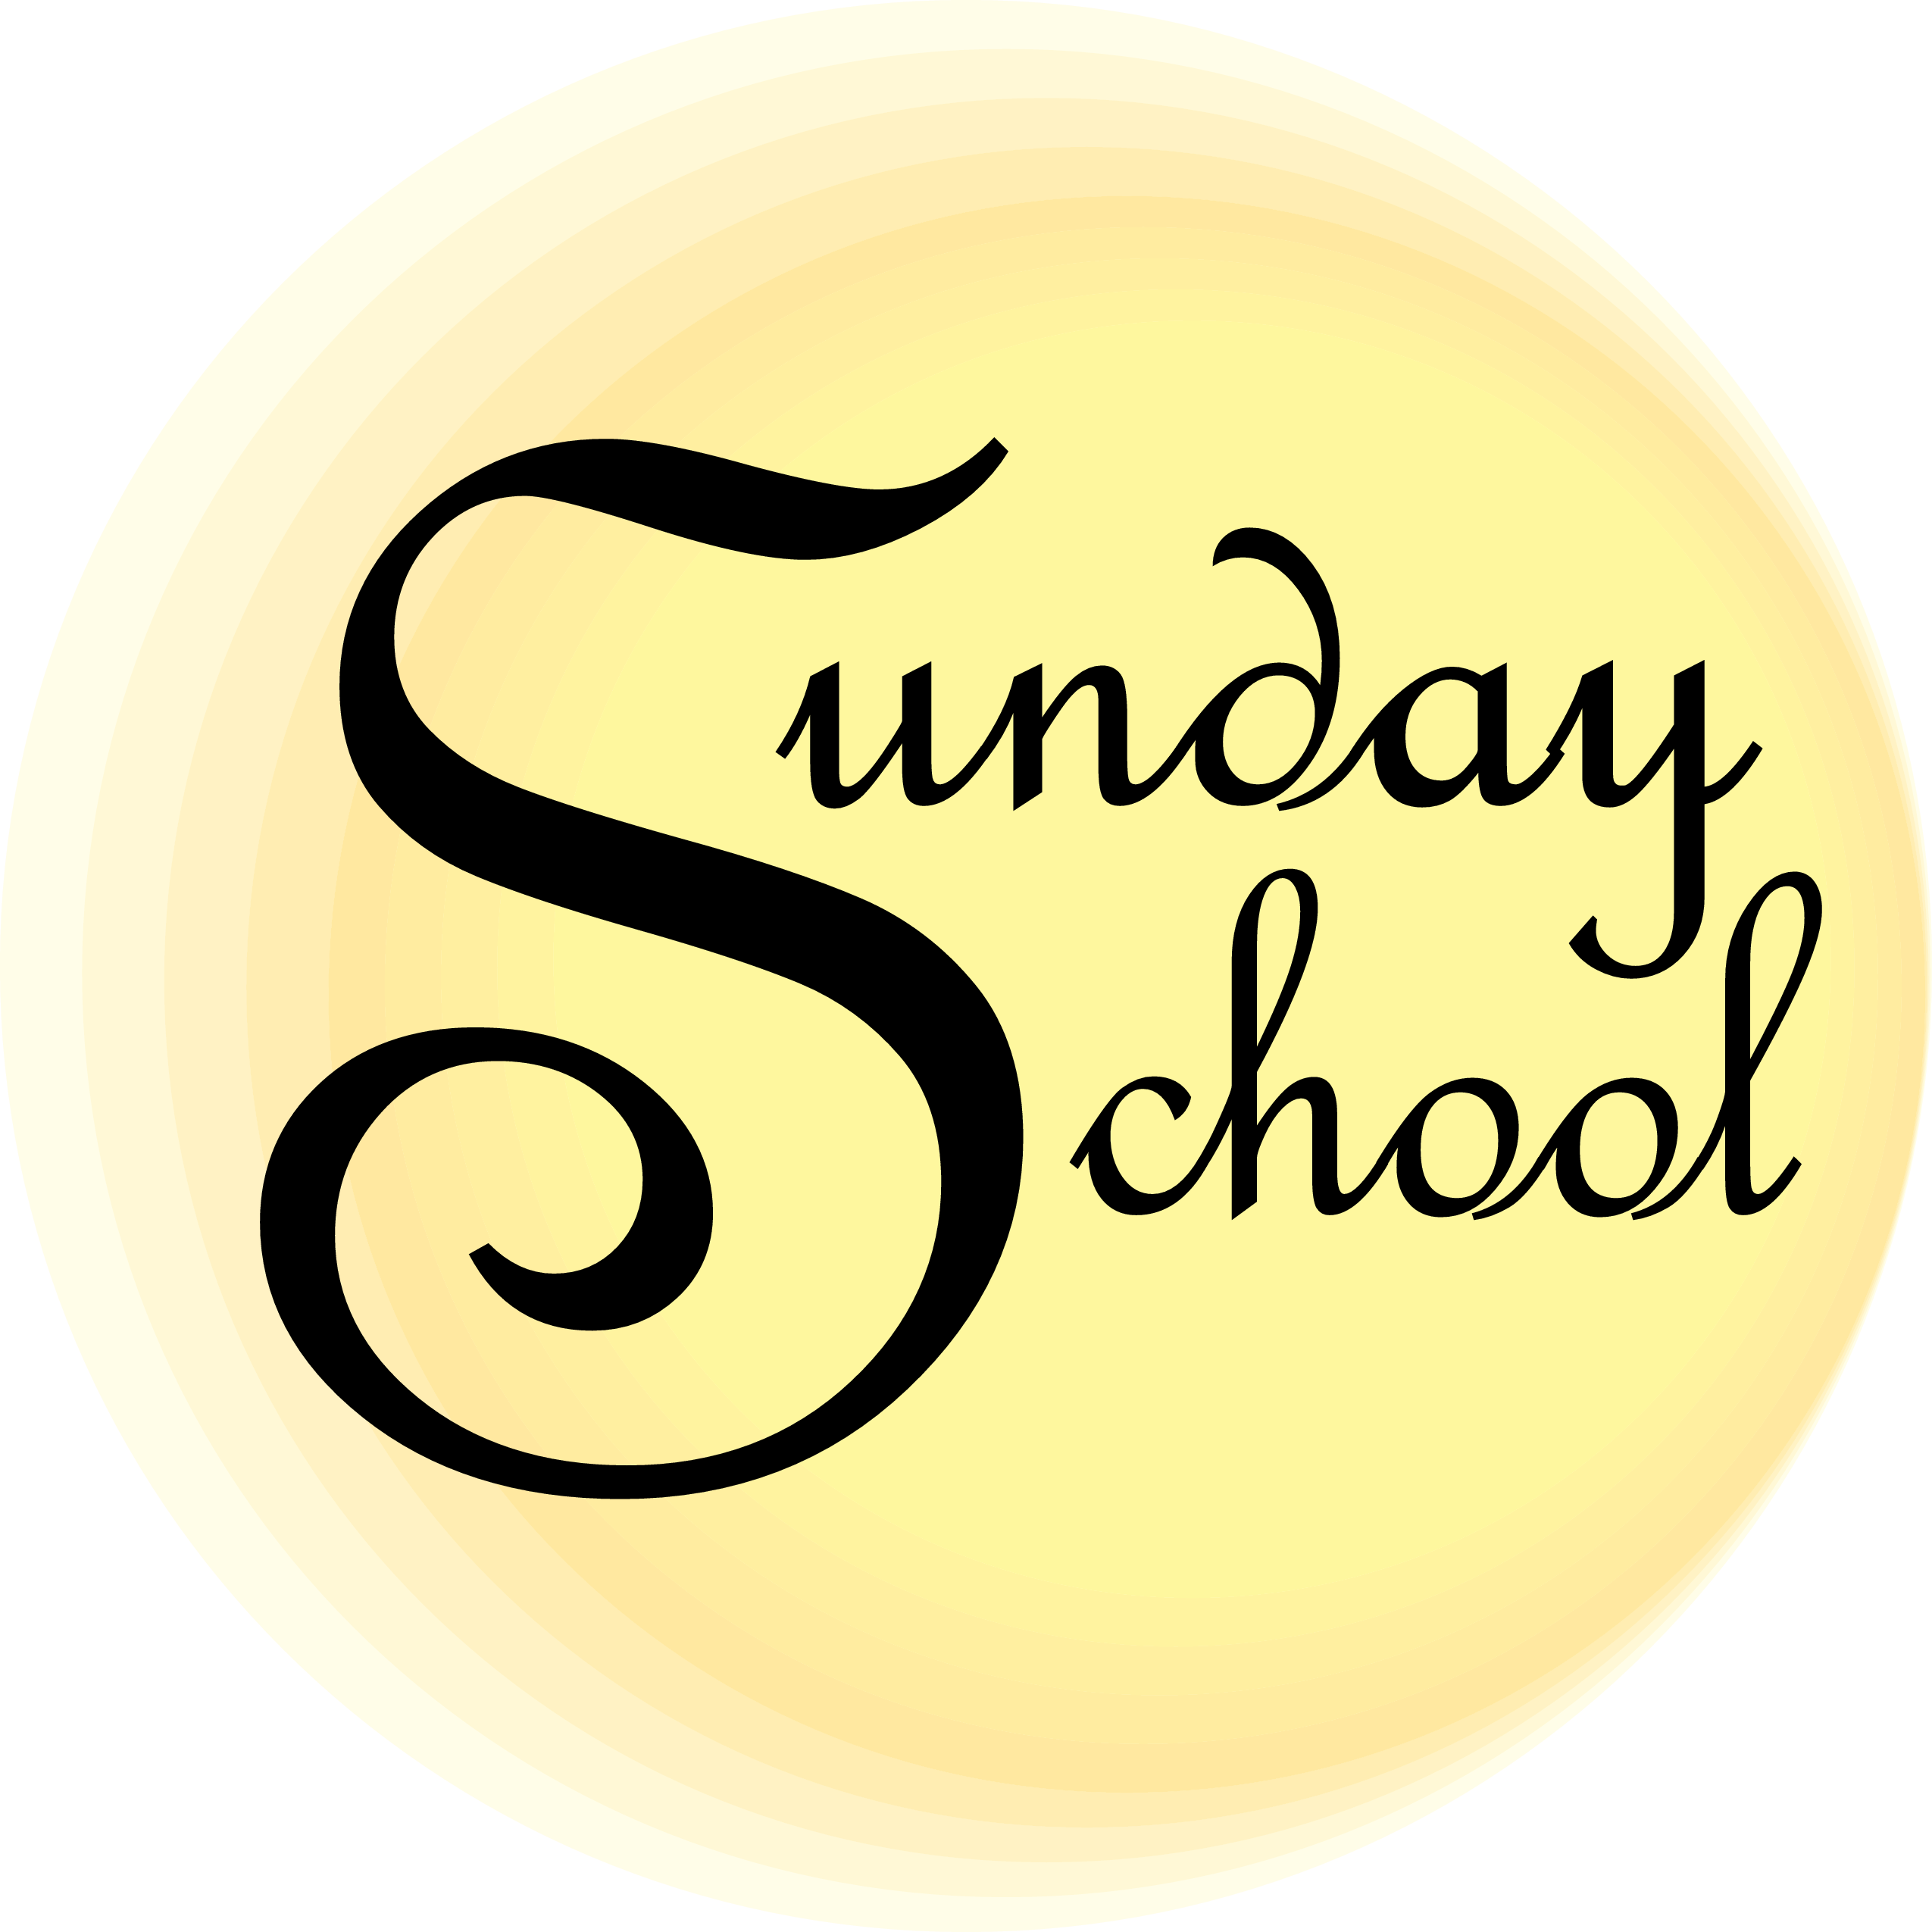 Sunday School | Saint Spyridon Greek Orthodox Cathedral